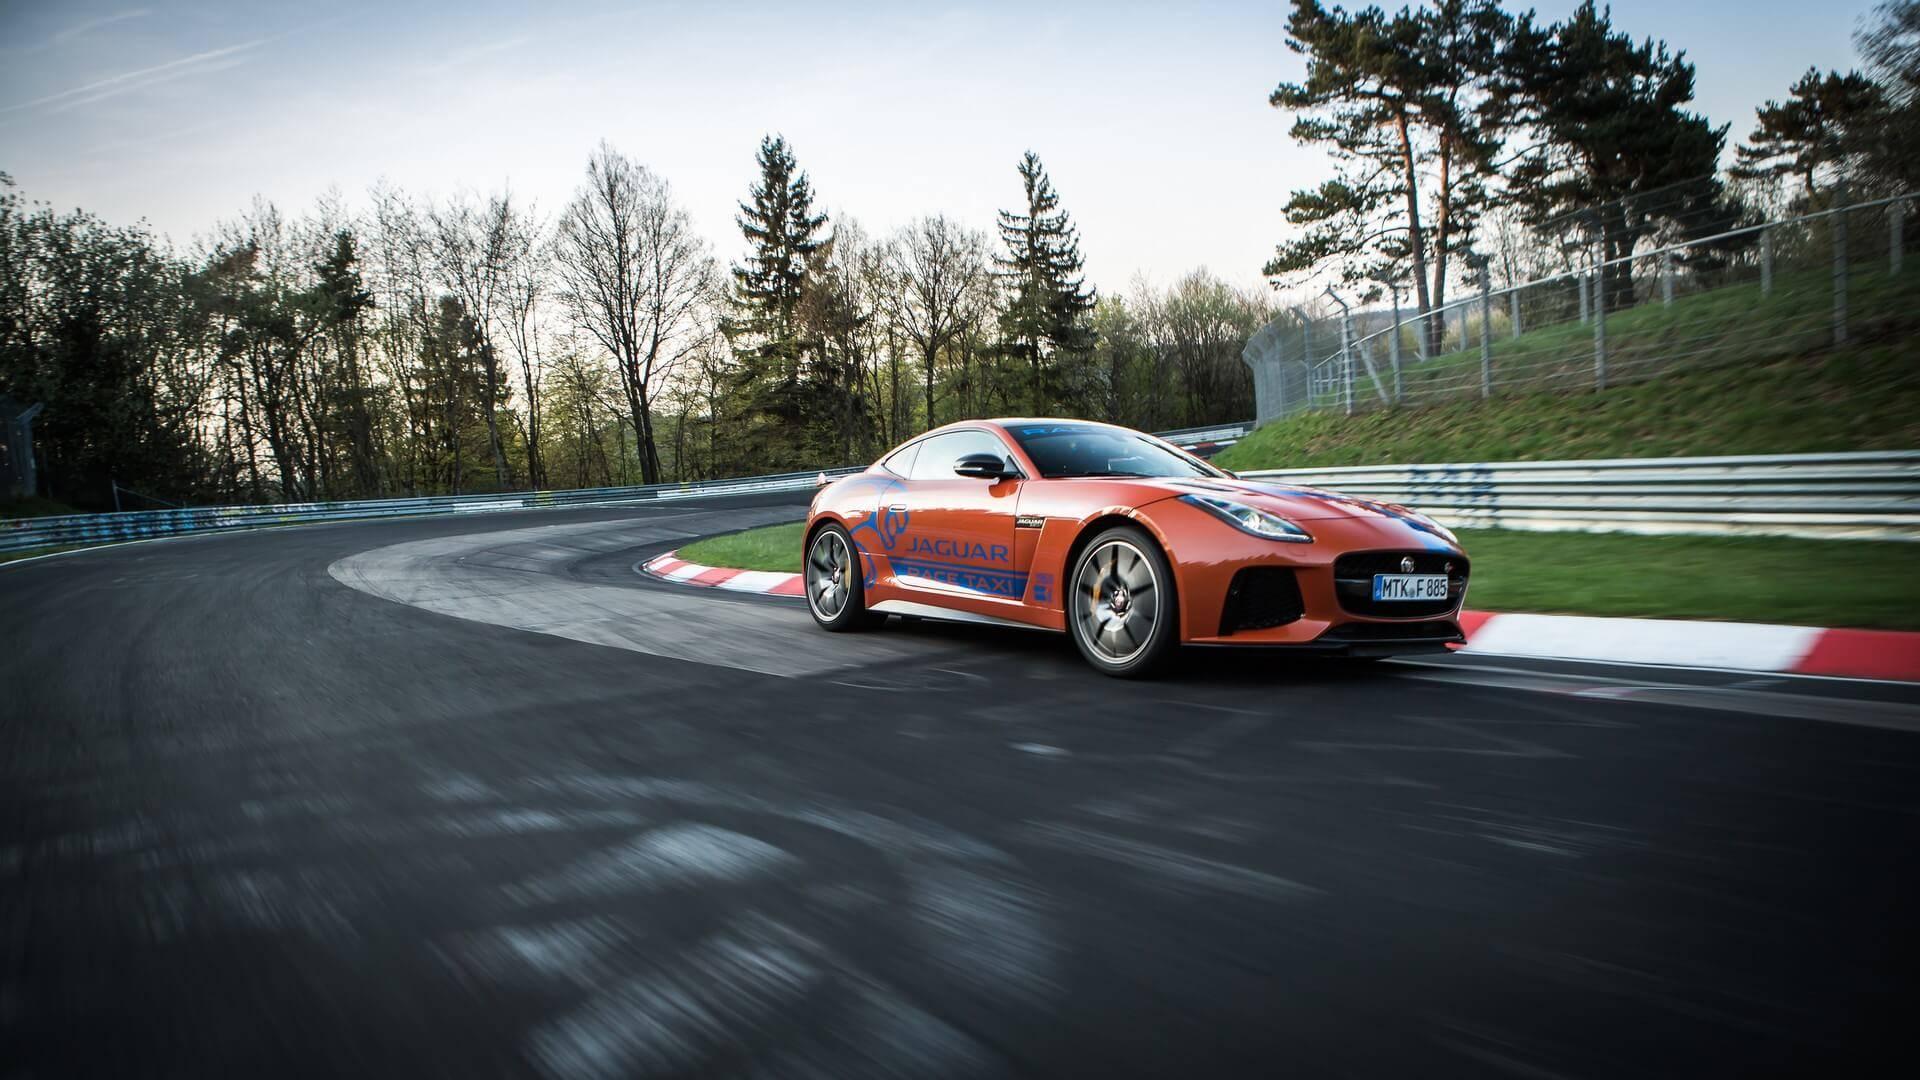 Jaguar_Nurburgring_taxi_0000